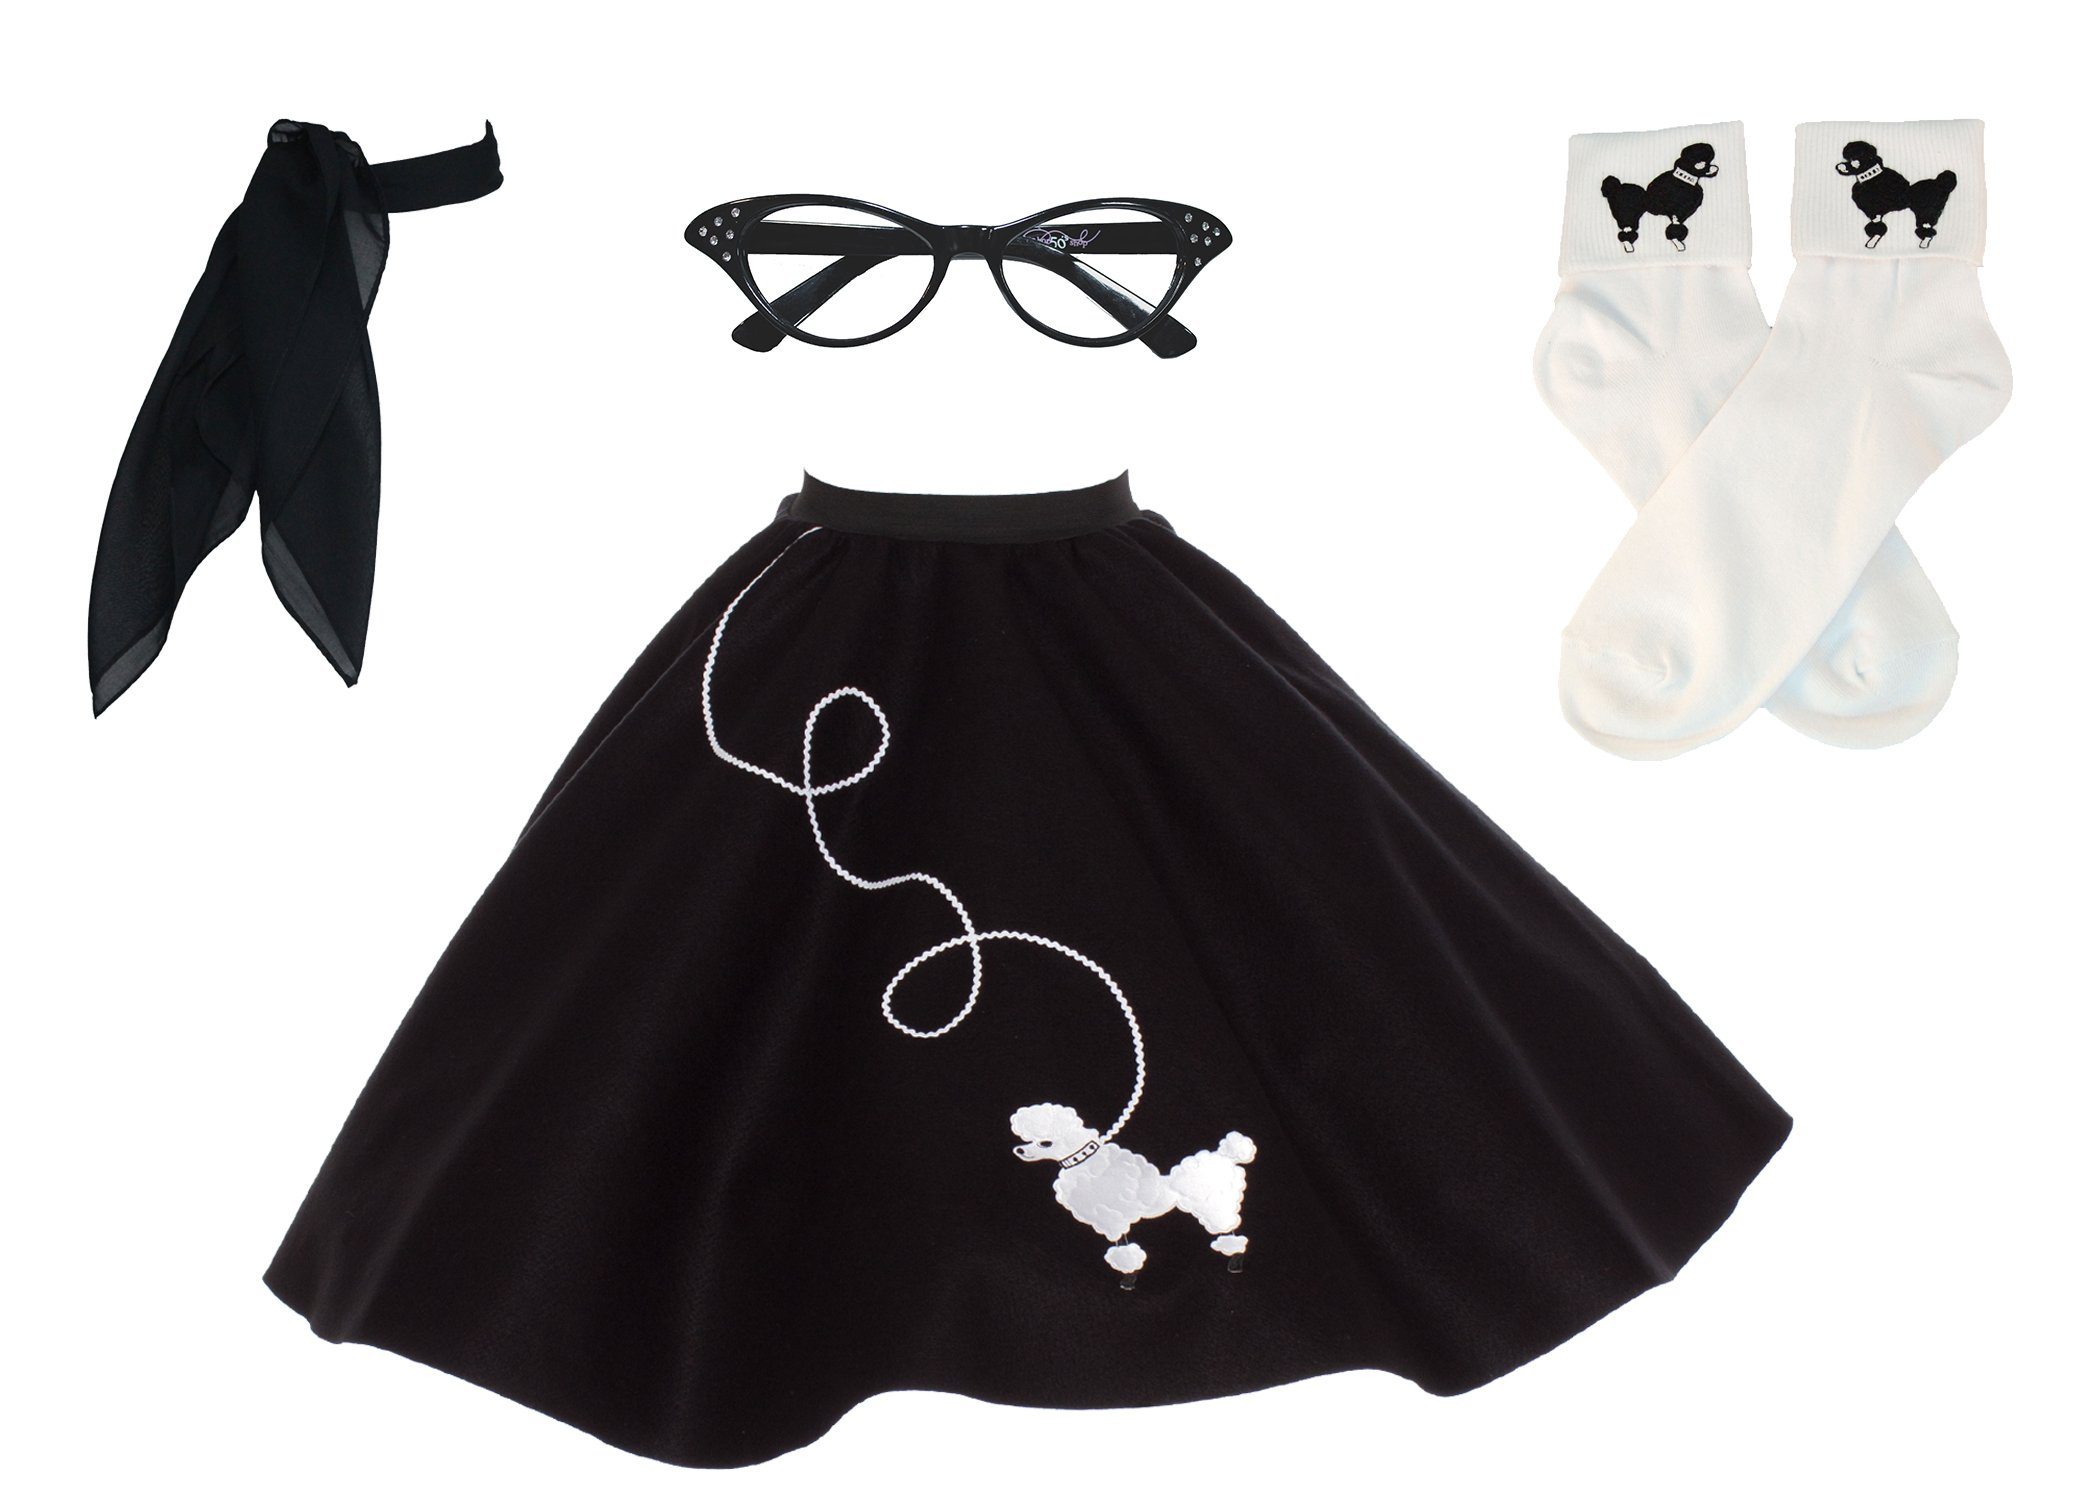 Hip Hop 50s Shop Adult 4 Piece Poodle Skirt Costume Set Black and White 3XLarge/4XLarge